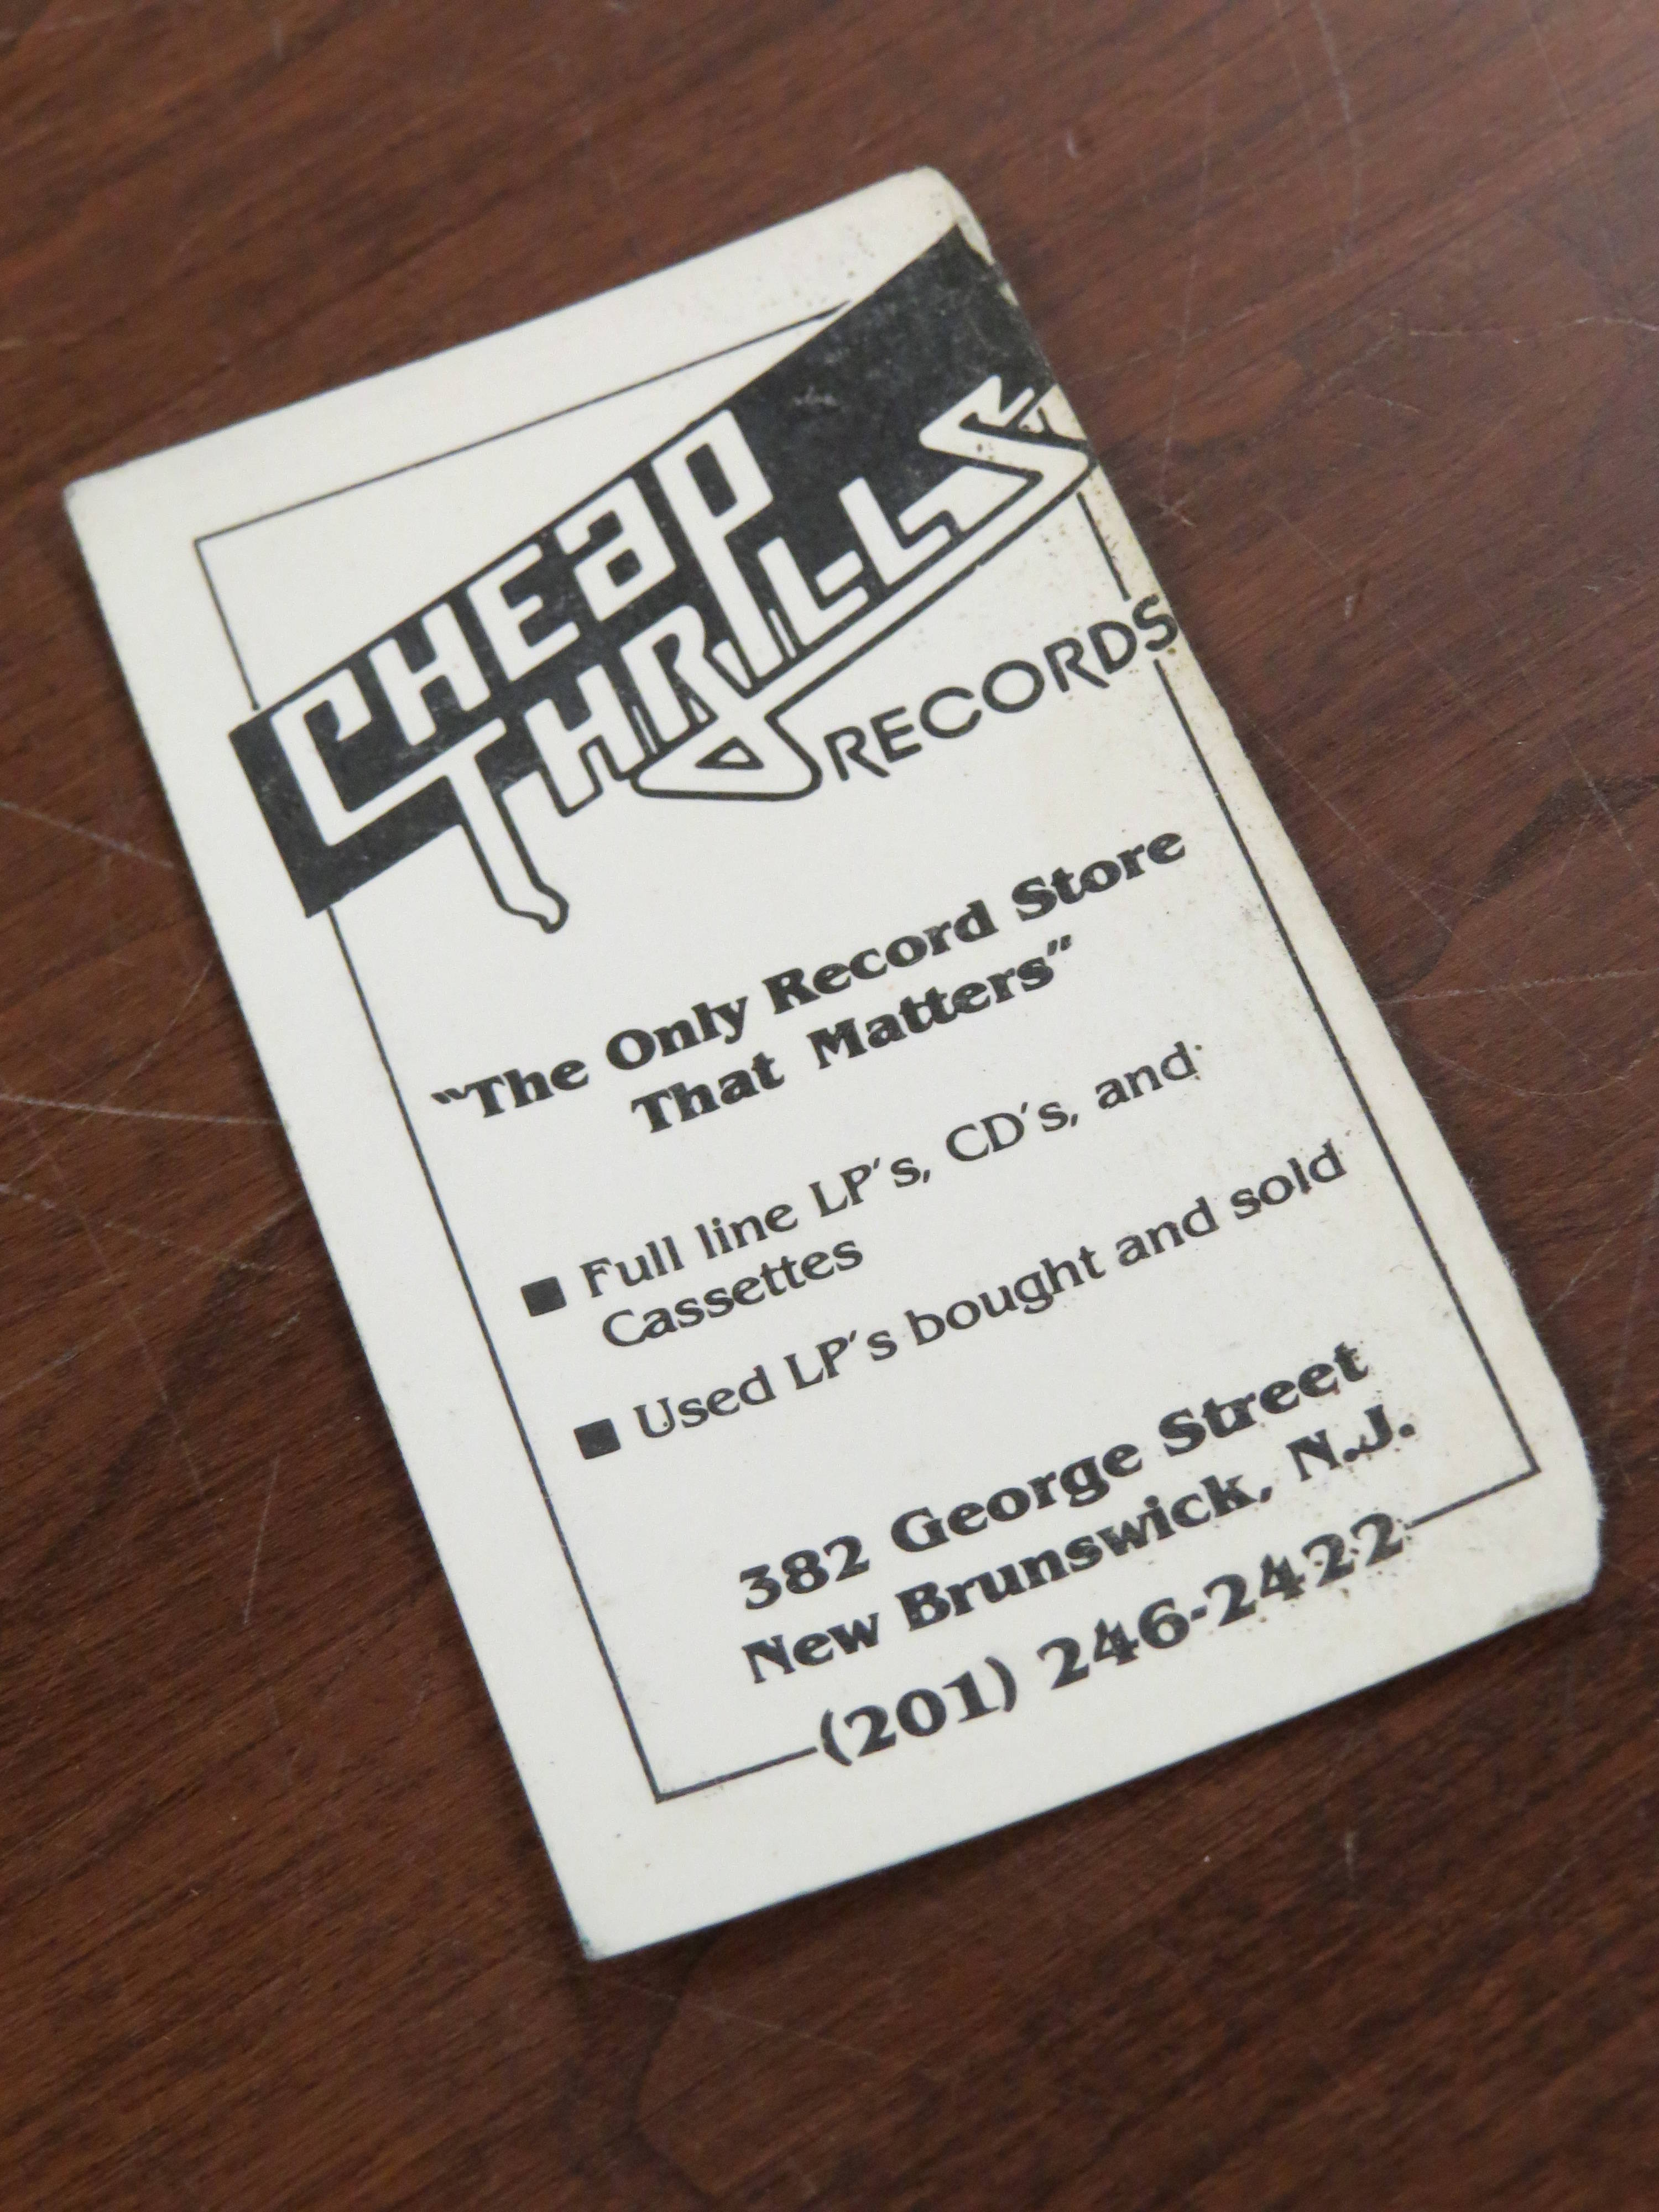 ce8363449dded8265f84_Cheap_Thrills_Records.JPG